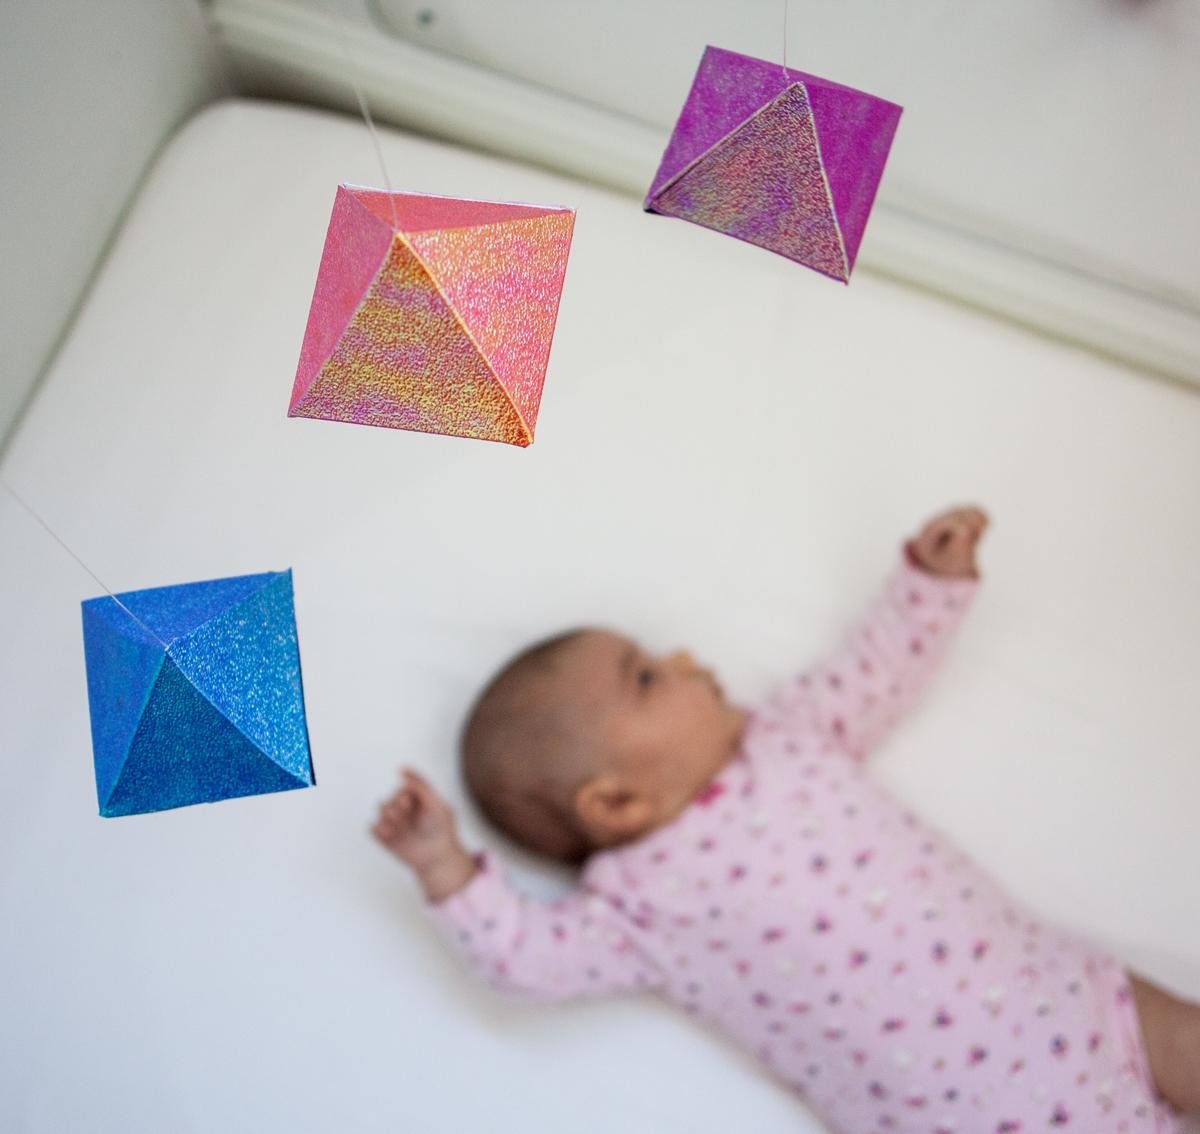 octahedron_mobile